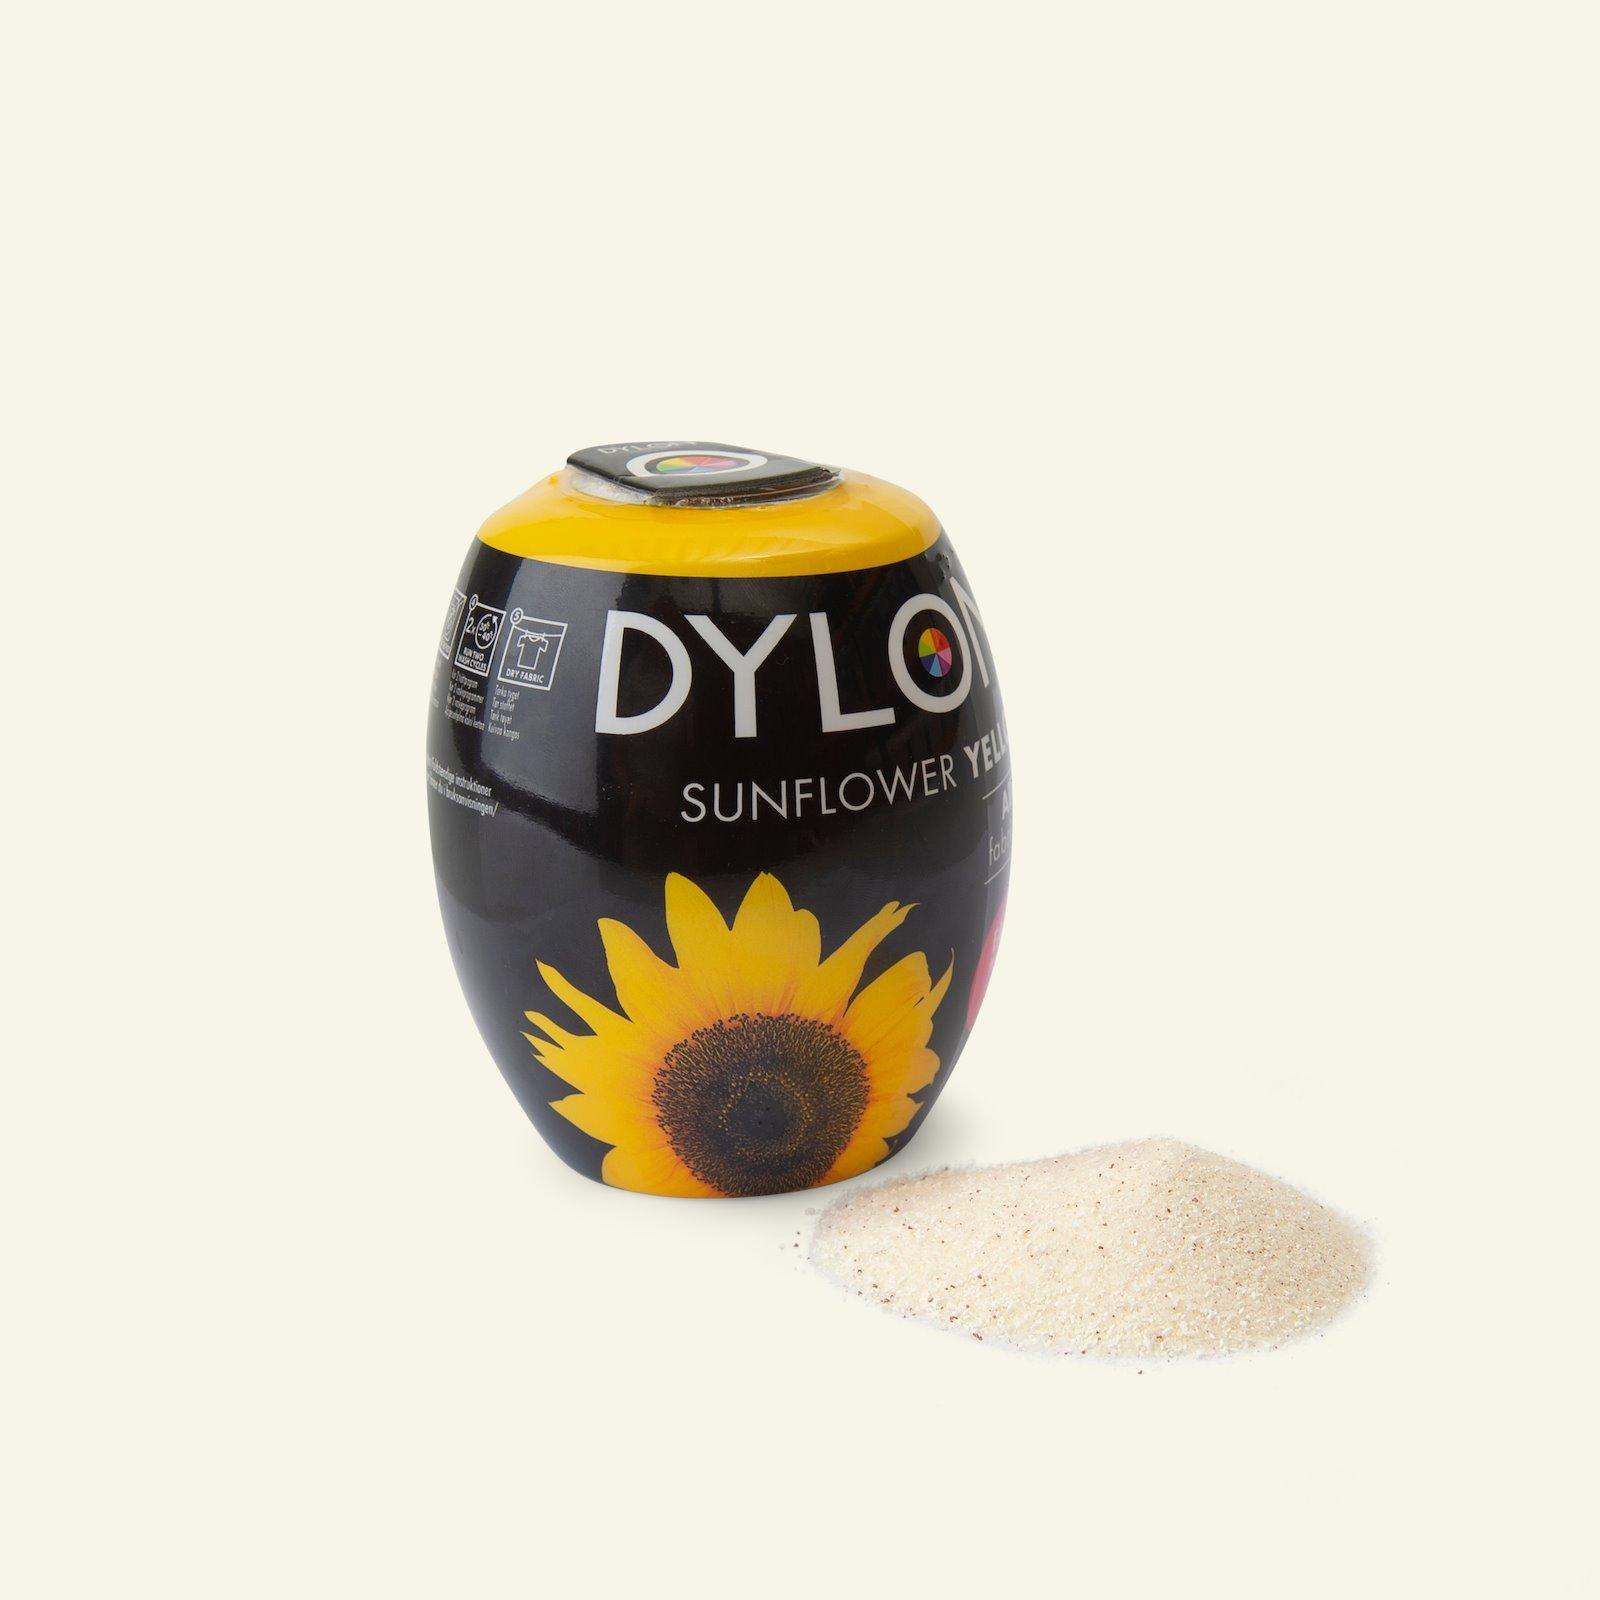 Dylon fabric dye for machine yellow 29701_pack